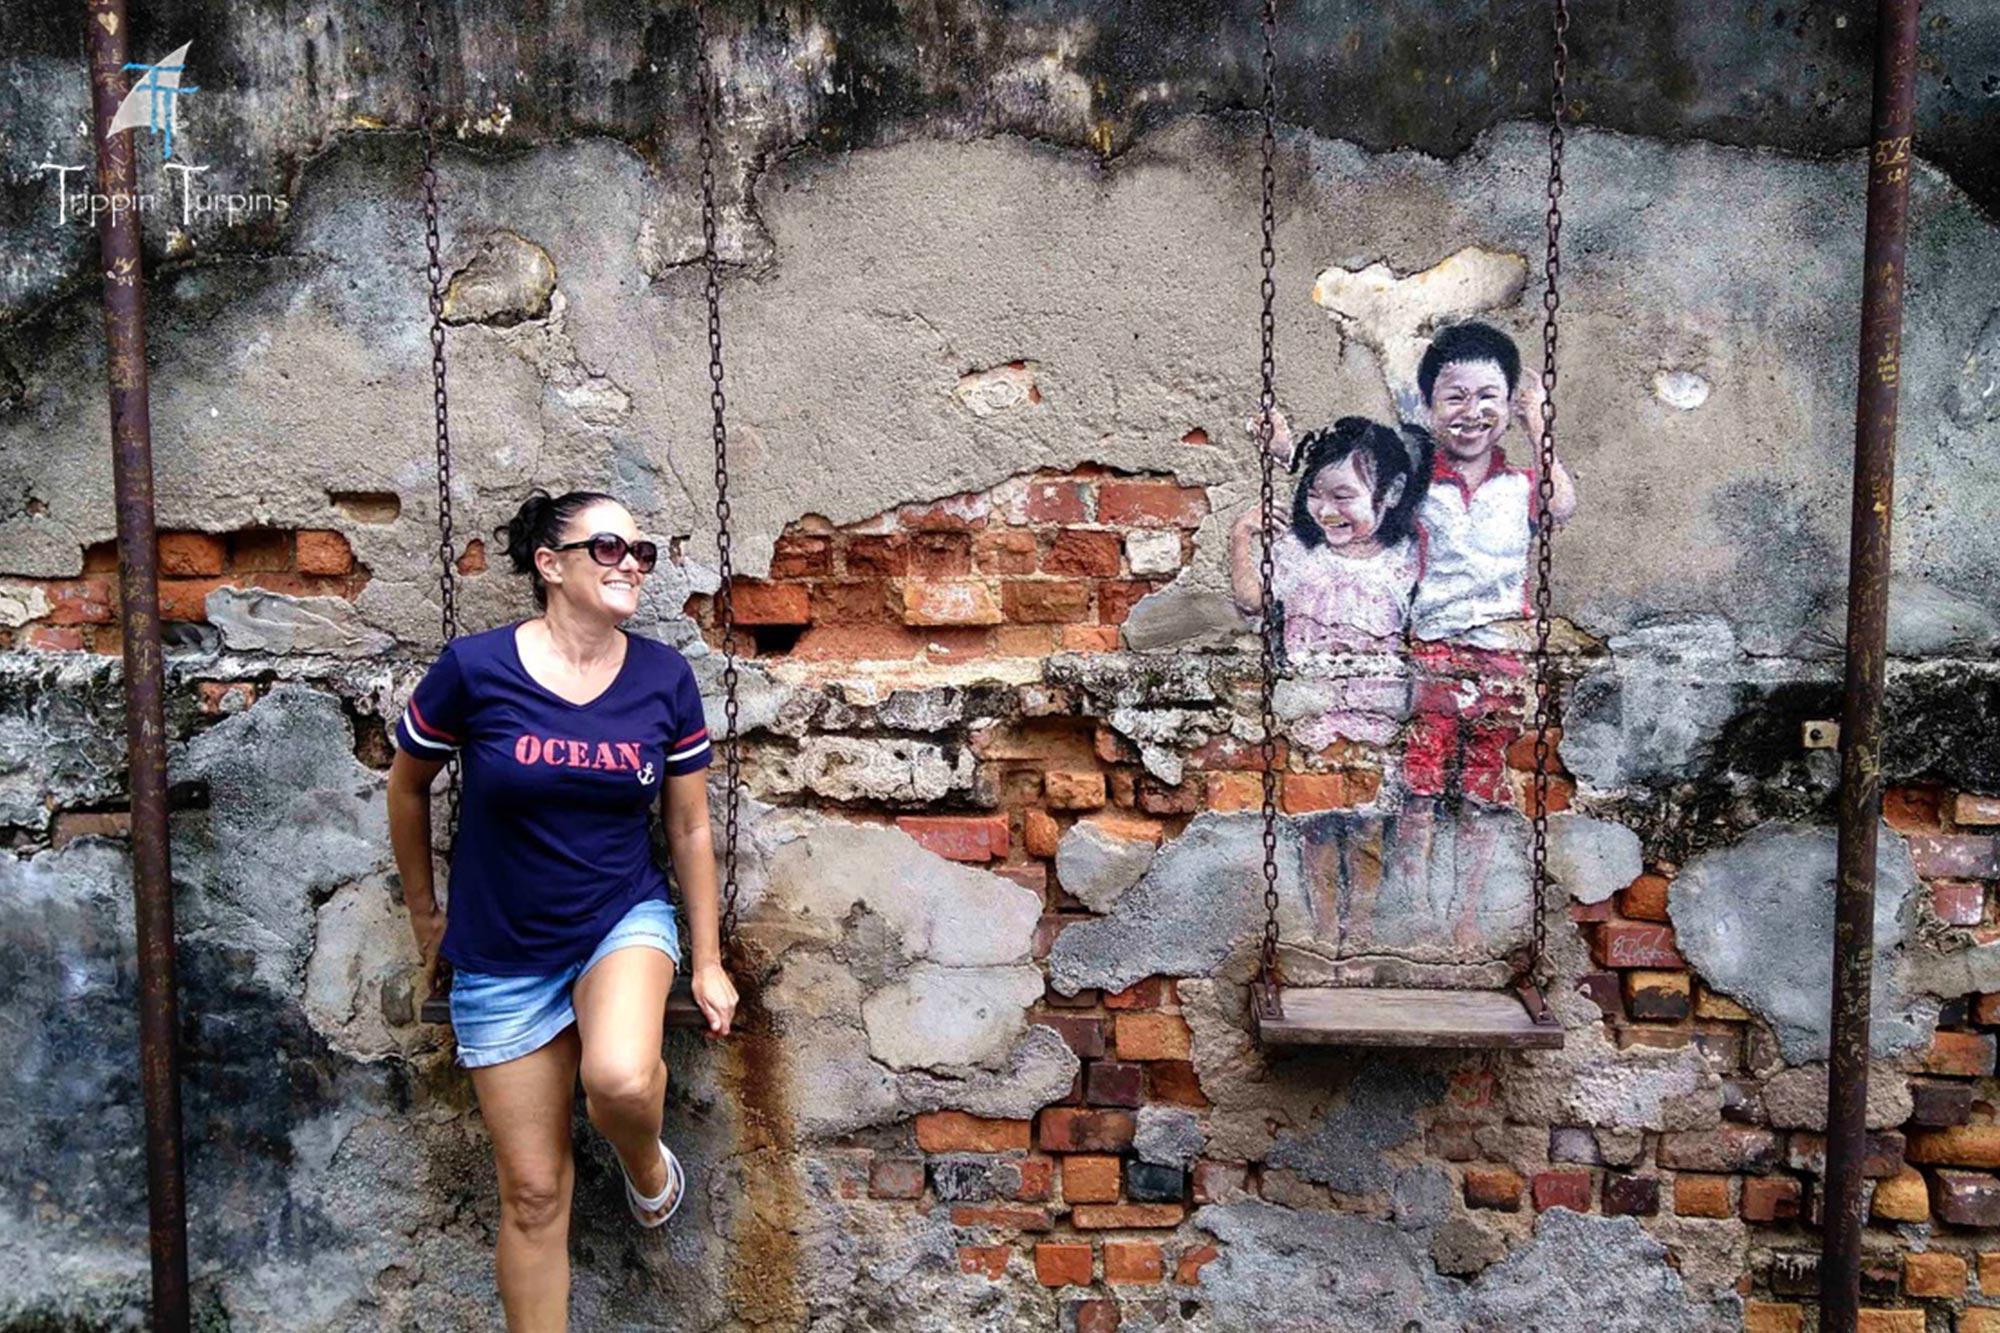 Georgetown street art in Penang, Malaysia